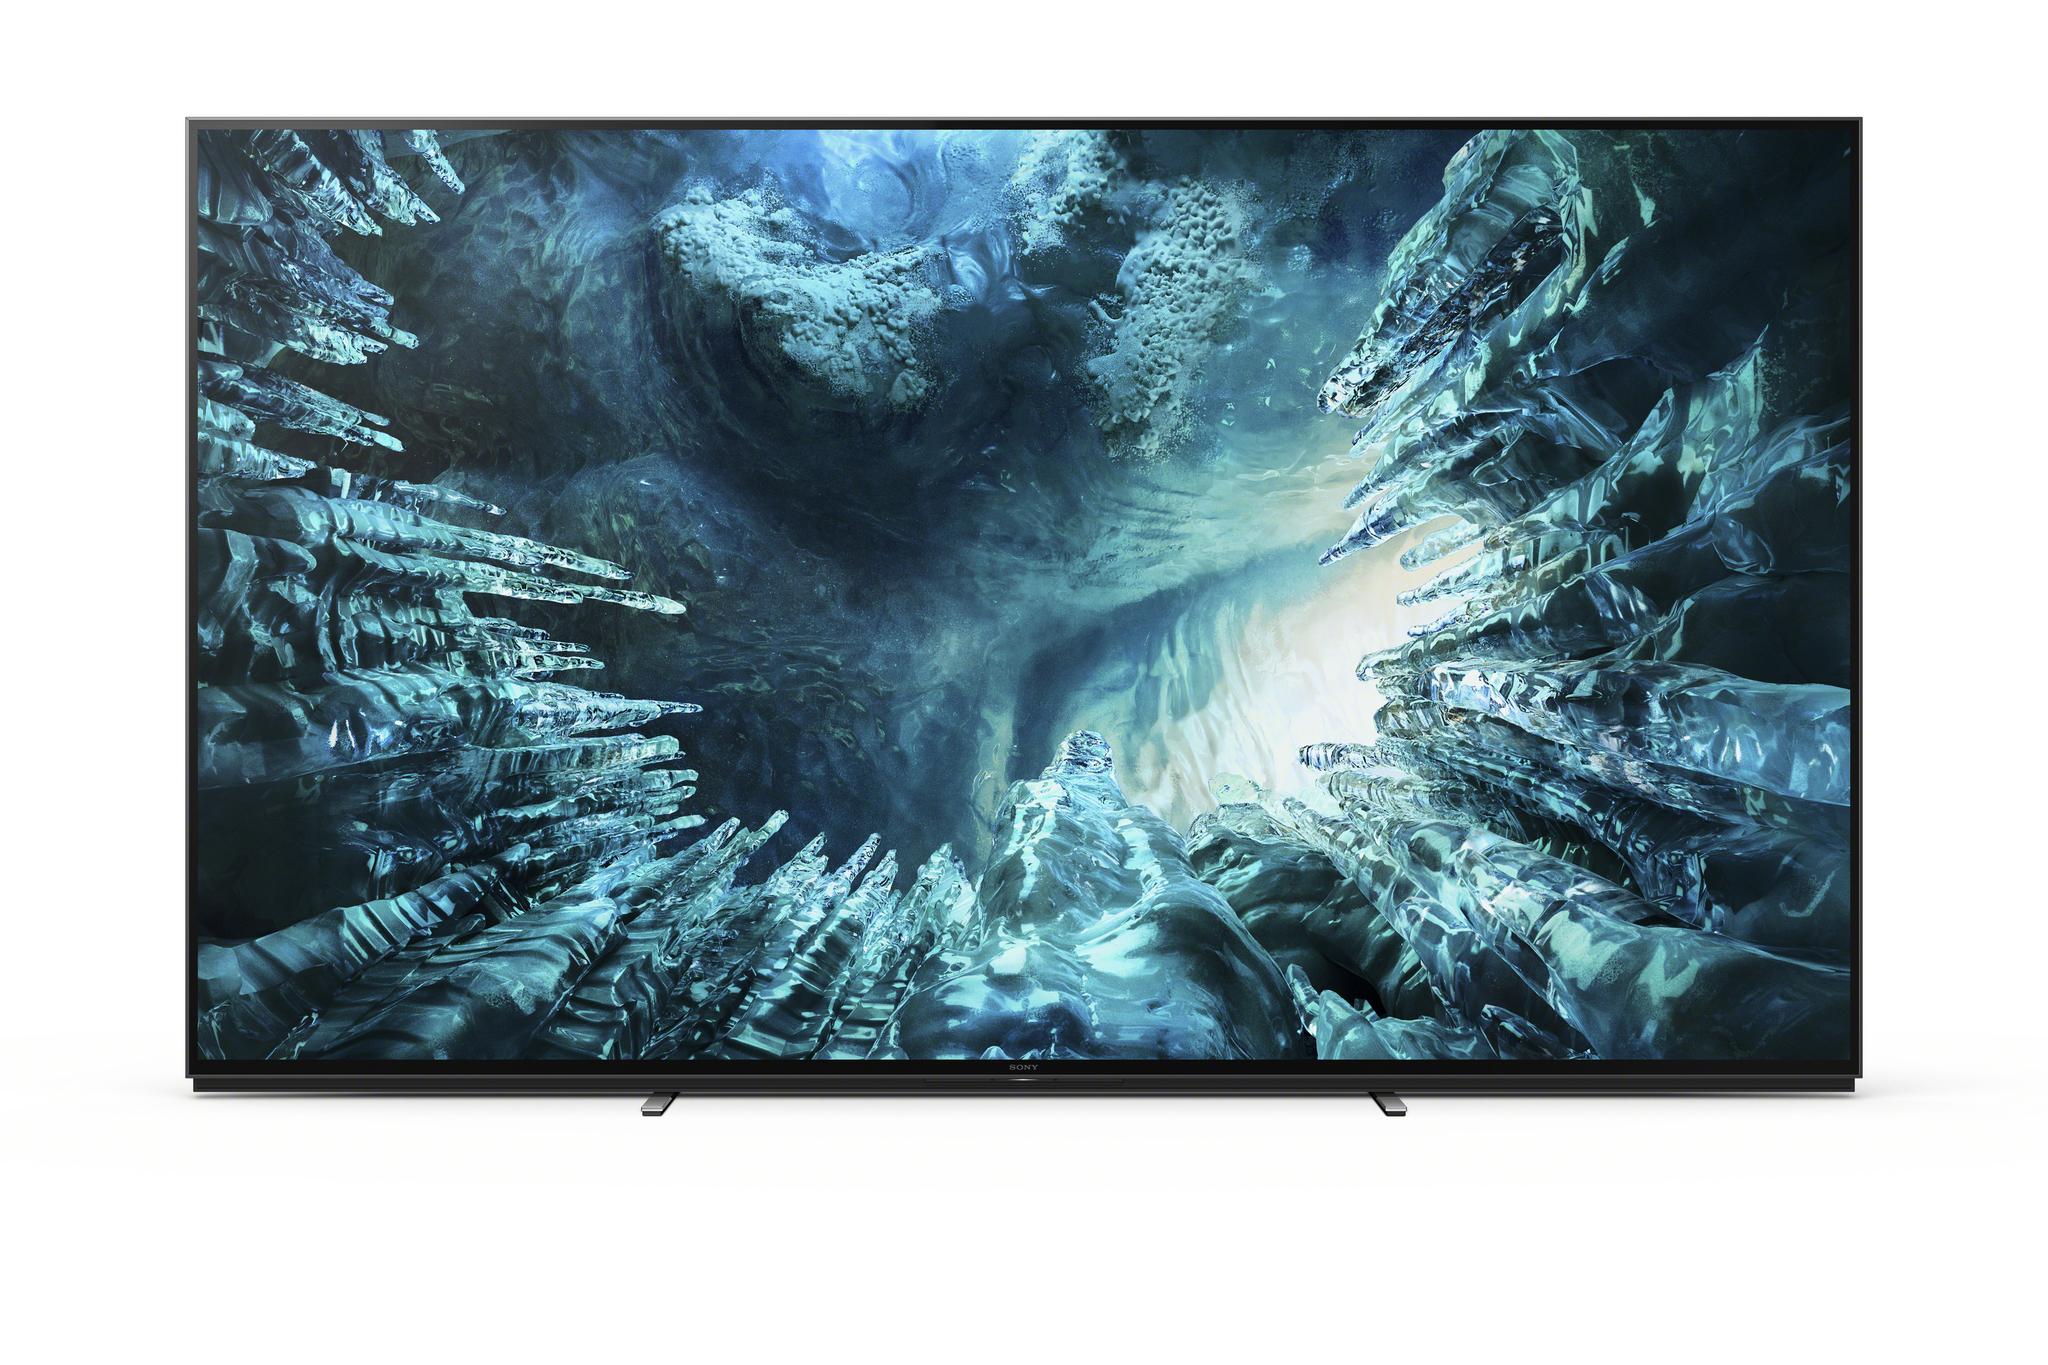 8K телевизор Sony Bravia KD-85ZH8 купить в Sony Centre Воронеж